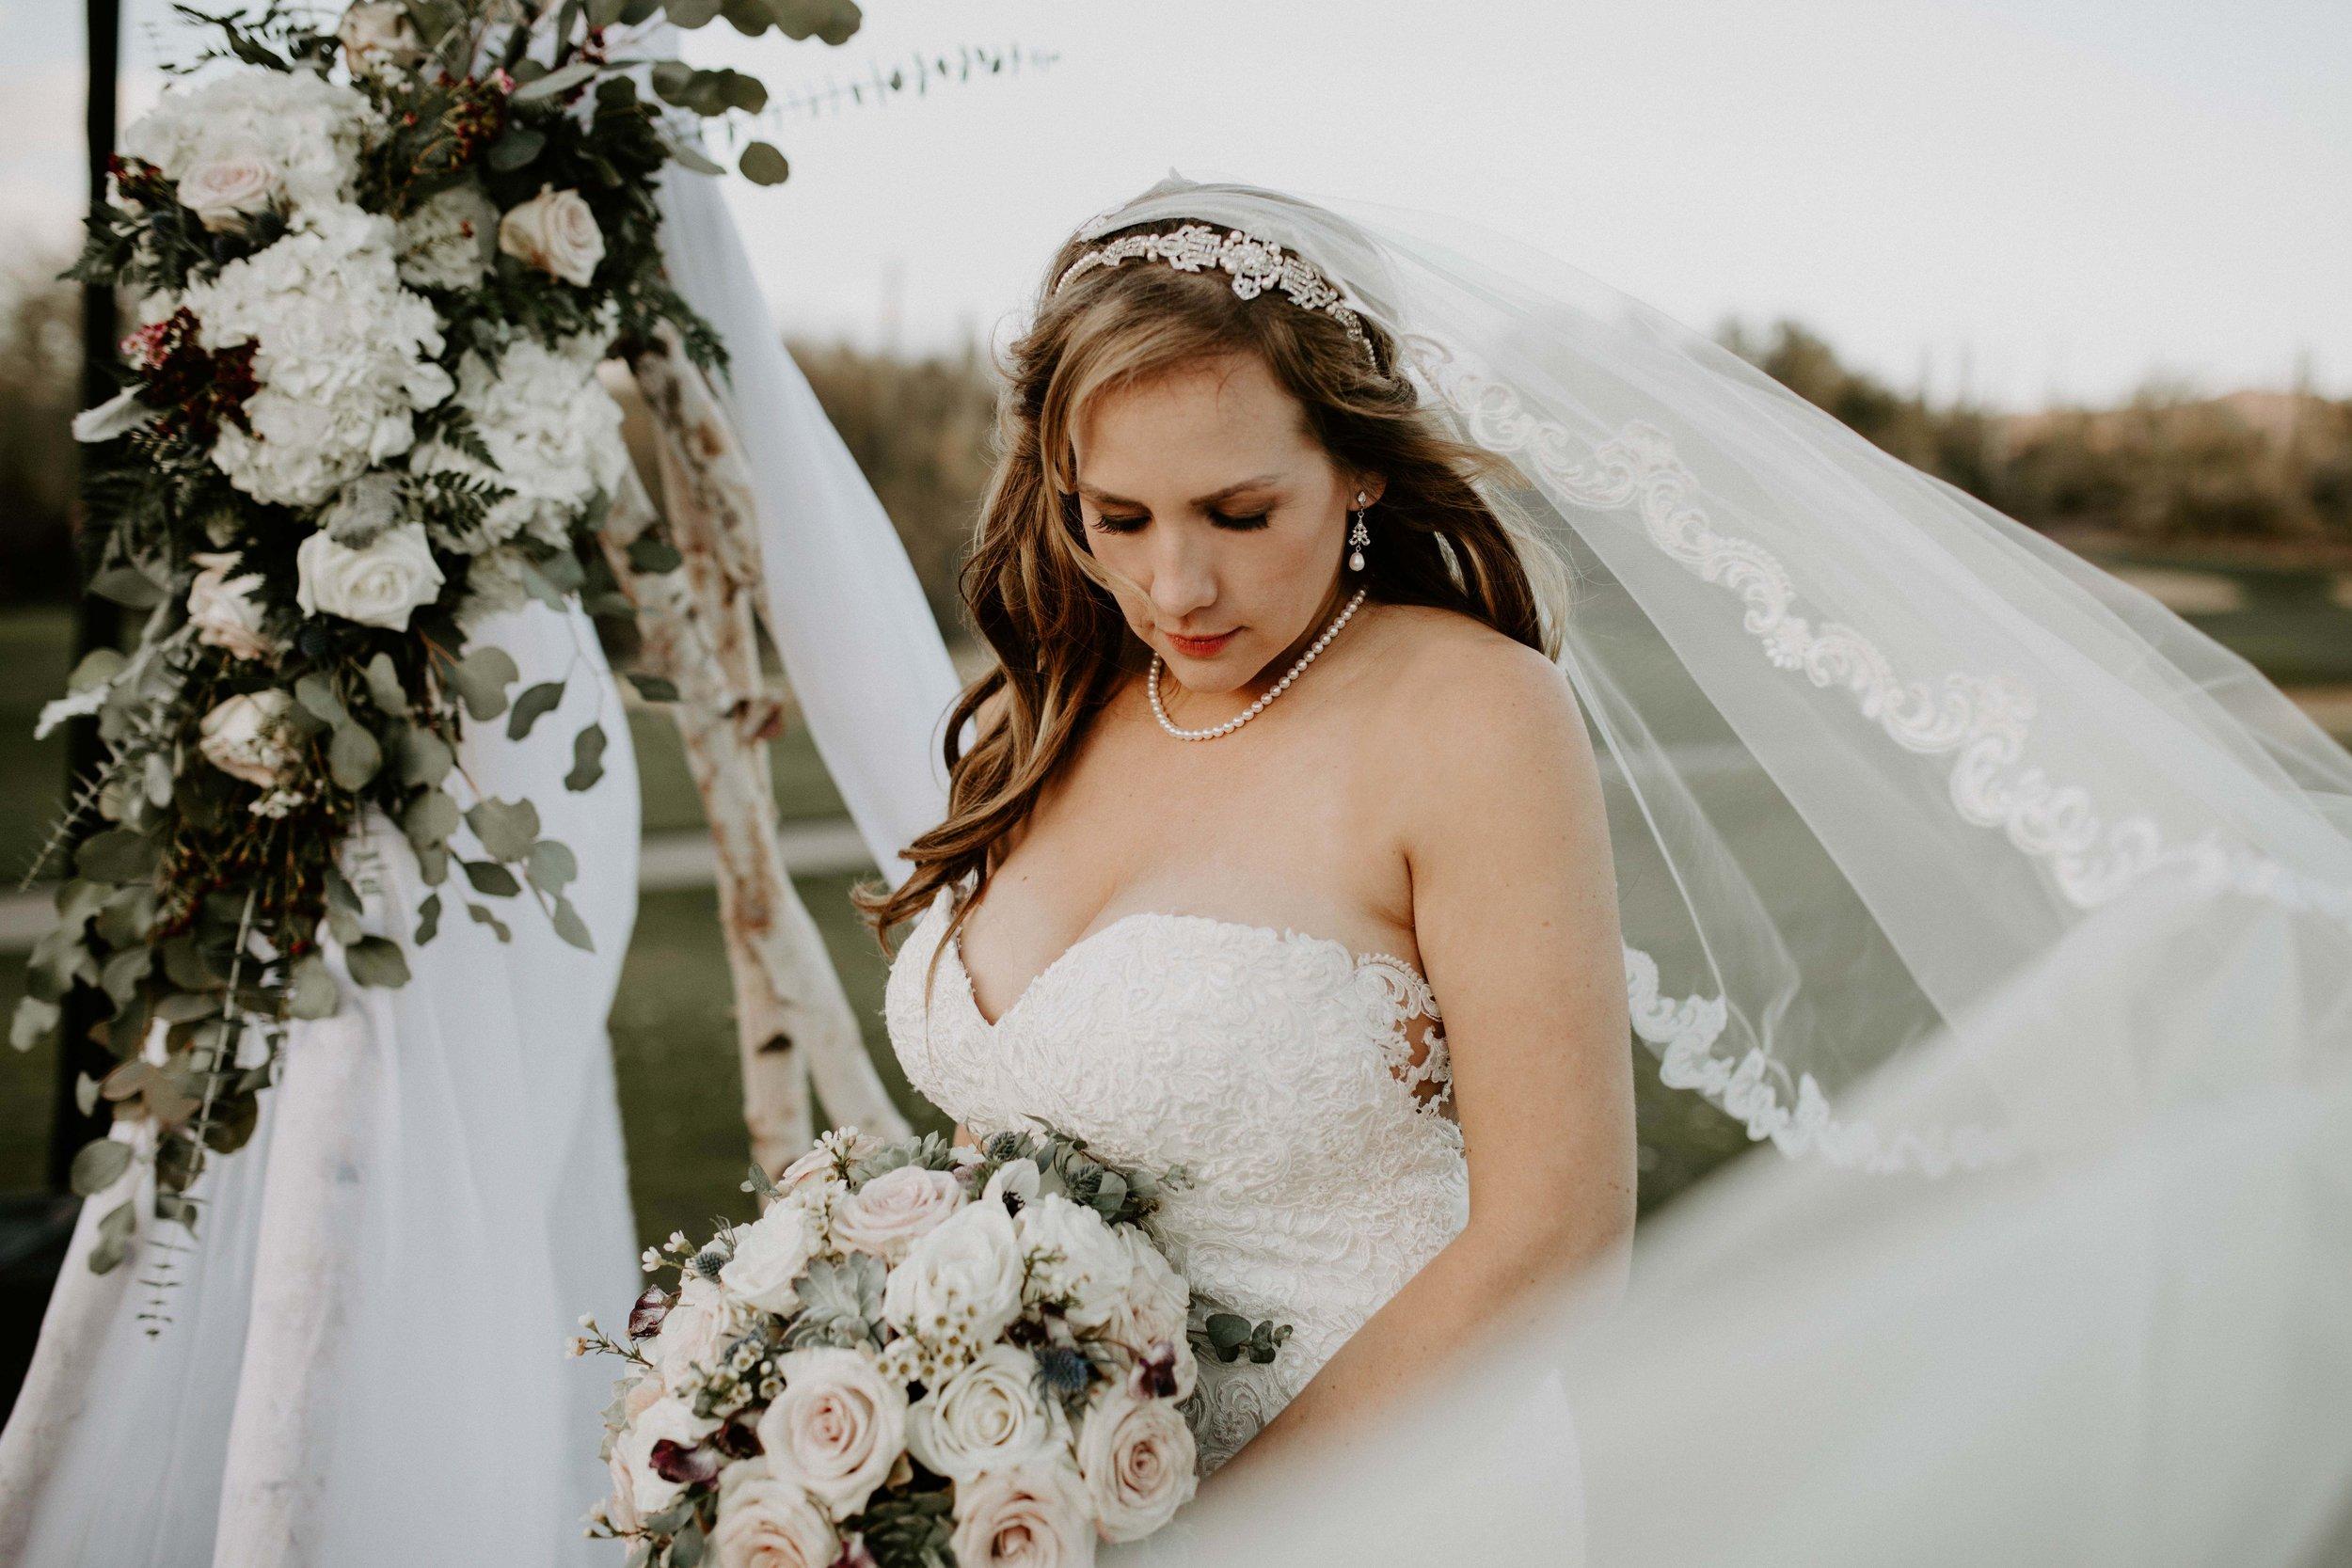 katieandbridgerwedding576.jpg